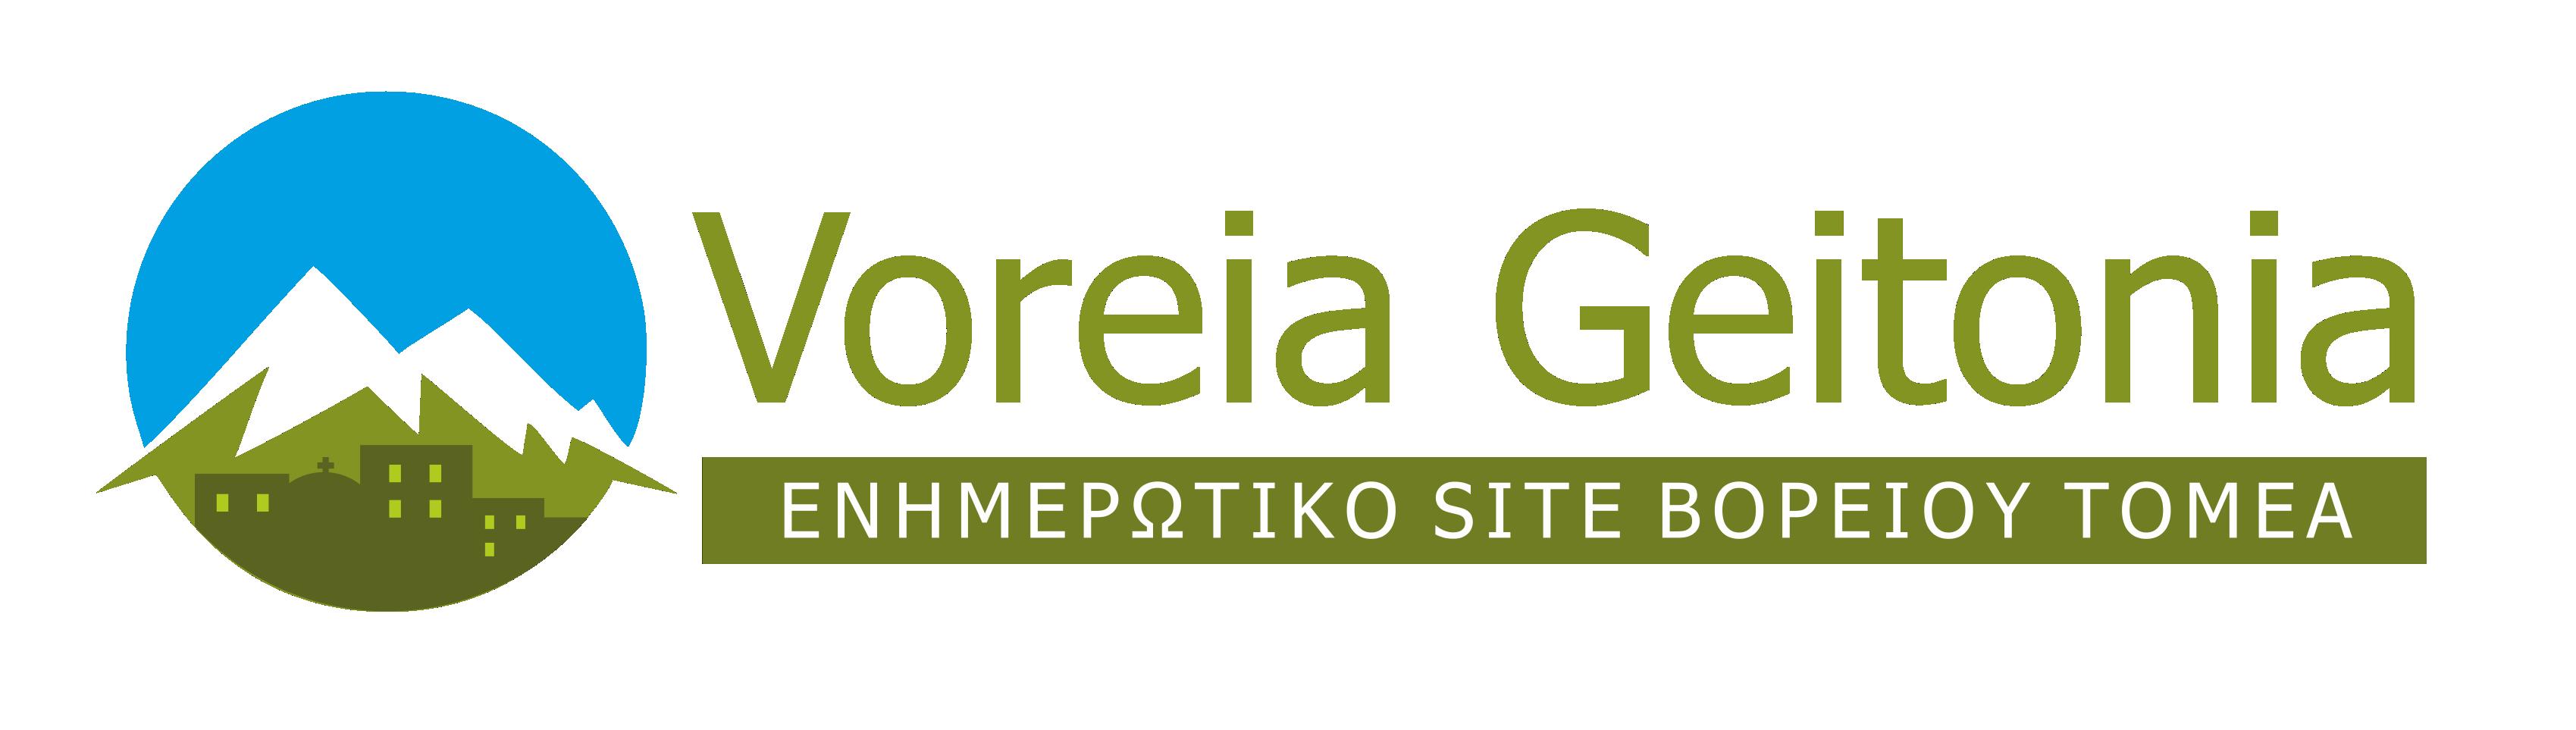 voreia-geitonia Βόρεια Γειτονιά: Από σήμερα αλλάζει με νέο και ανανεωμένο λογότυπο